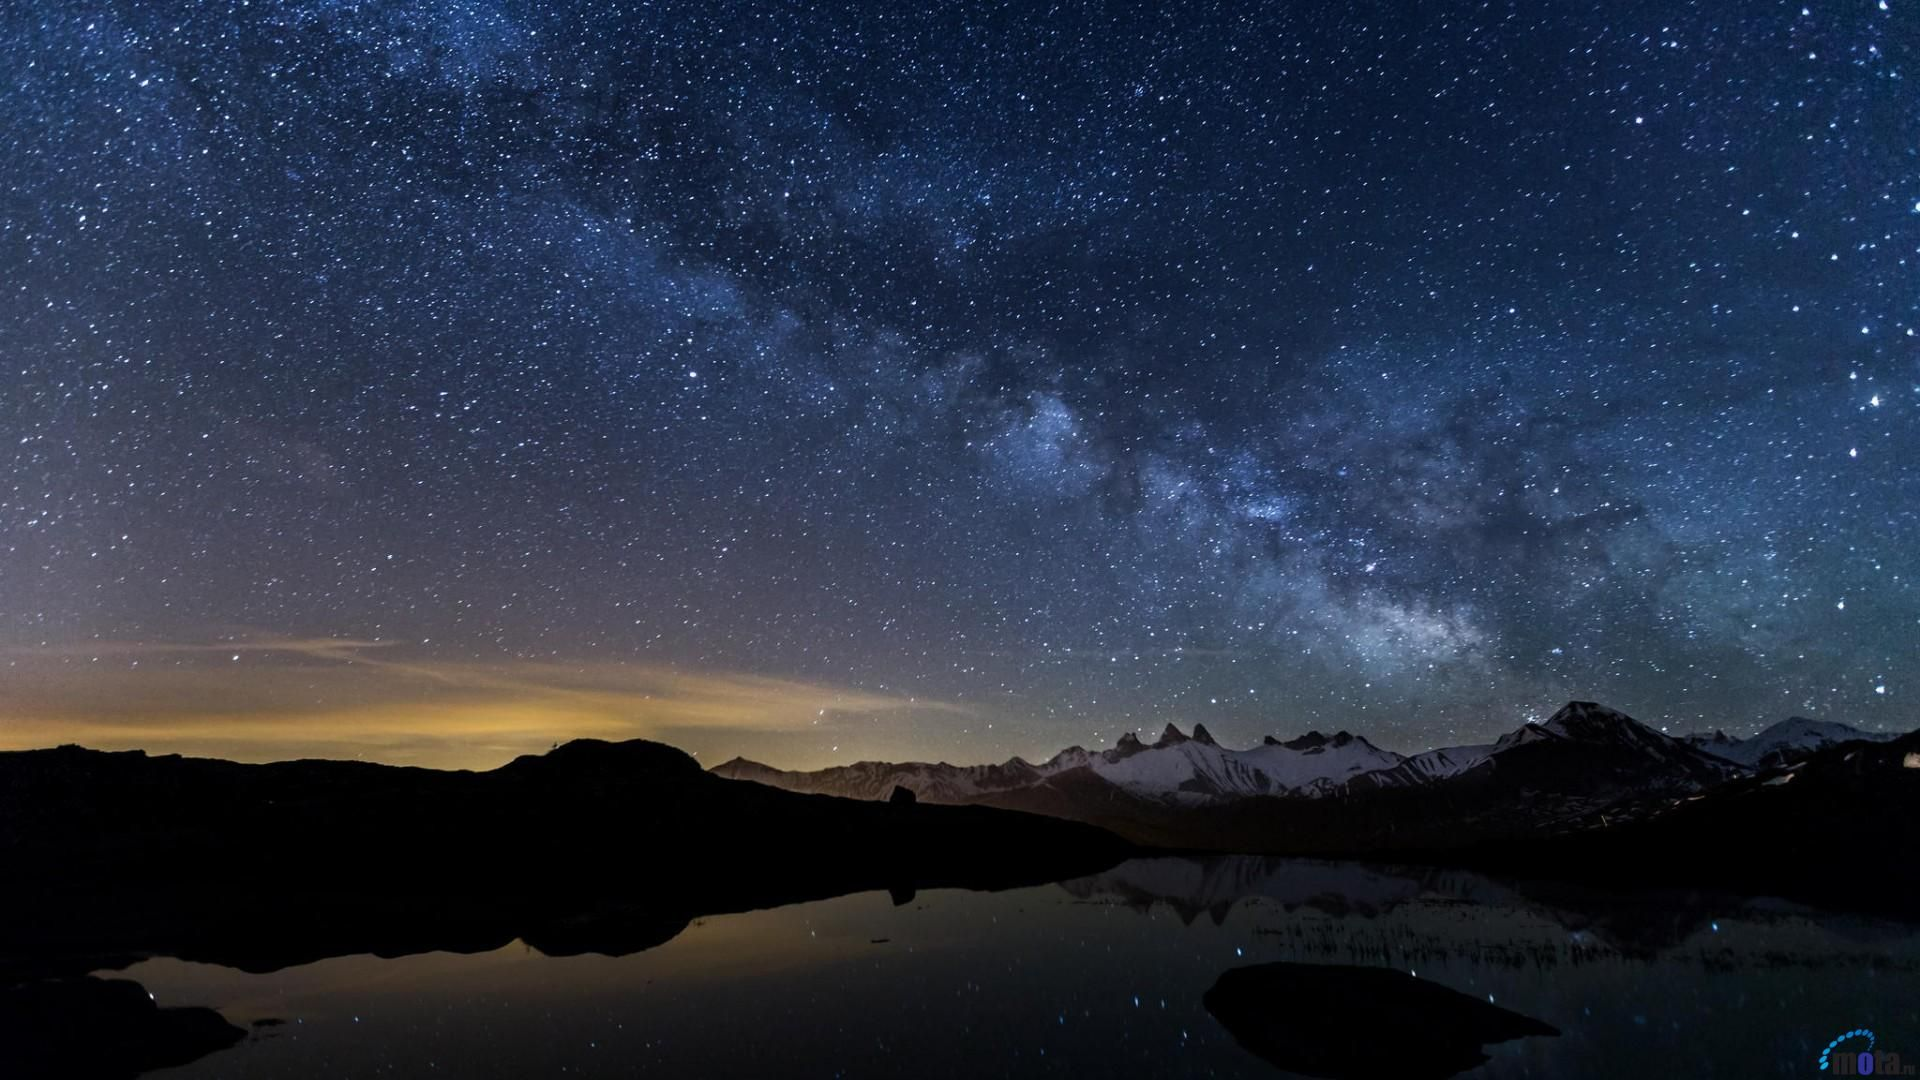 wallpaper desktop a· night sky